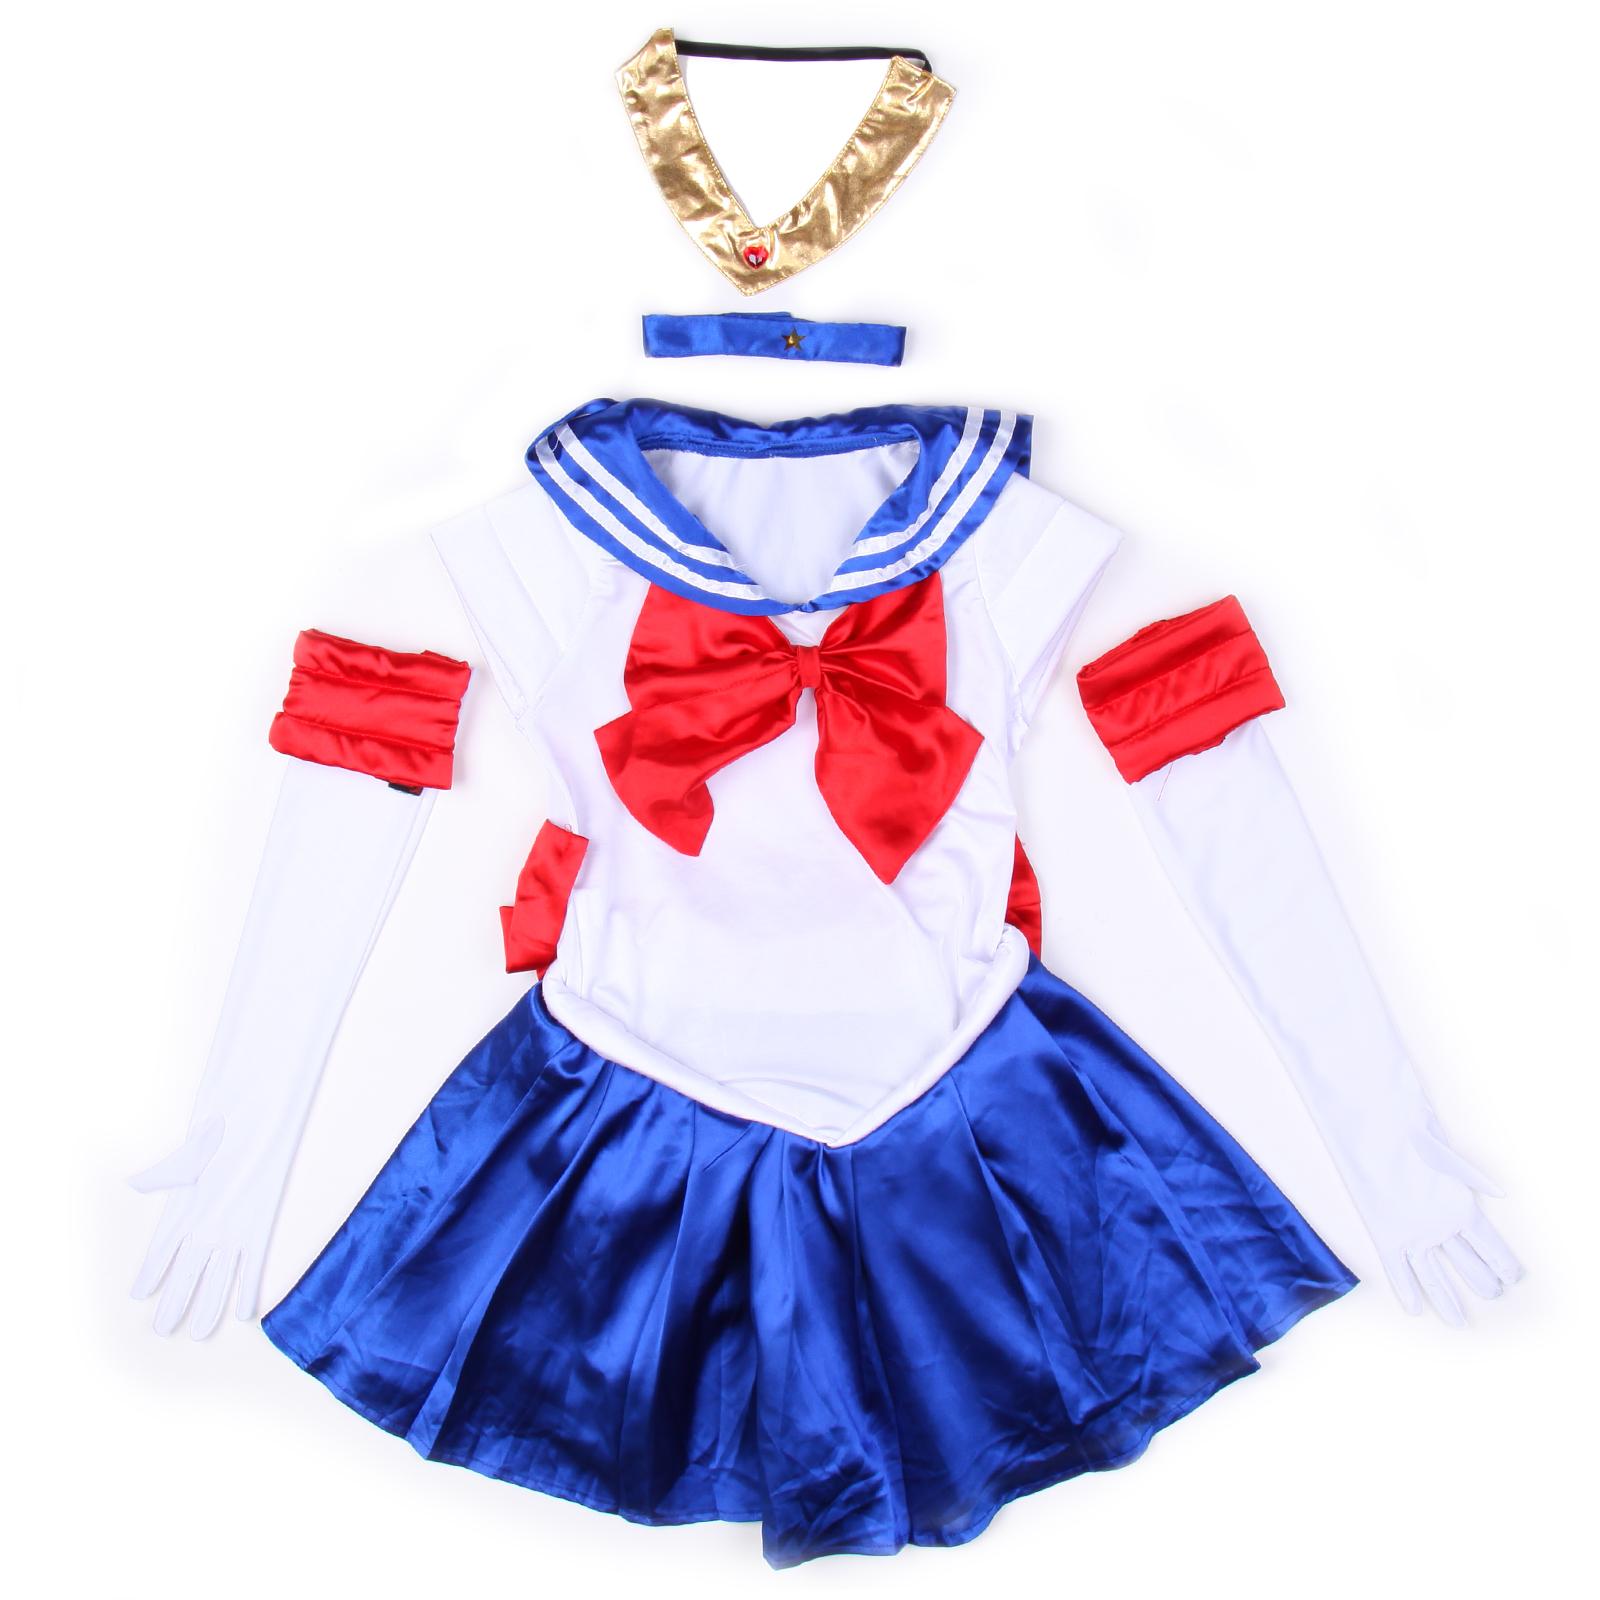 Sailor Moon Costume Cosplay Uniform Sailormoon Fancy Dress ...